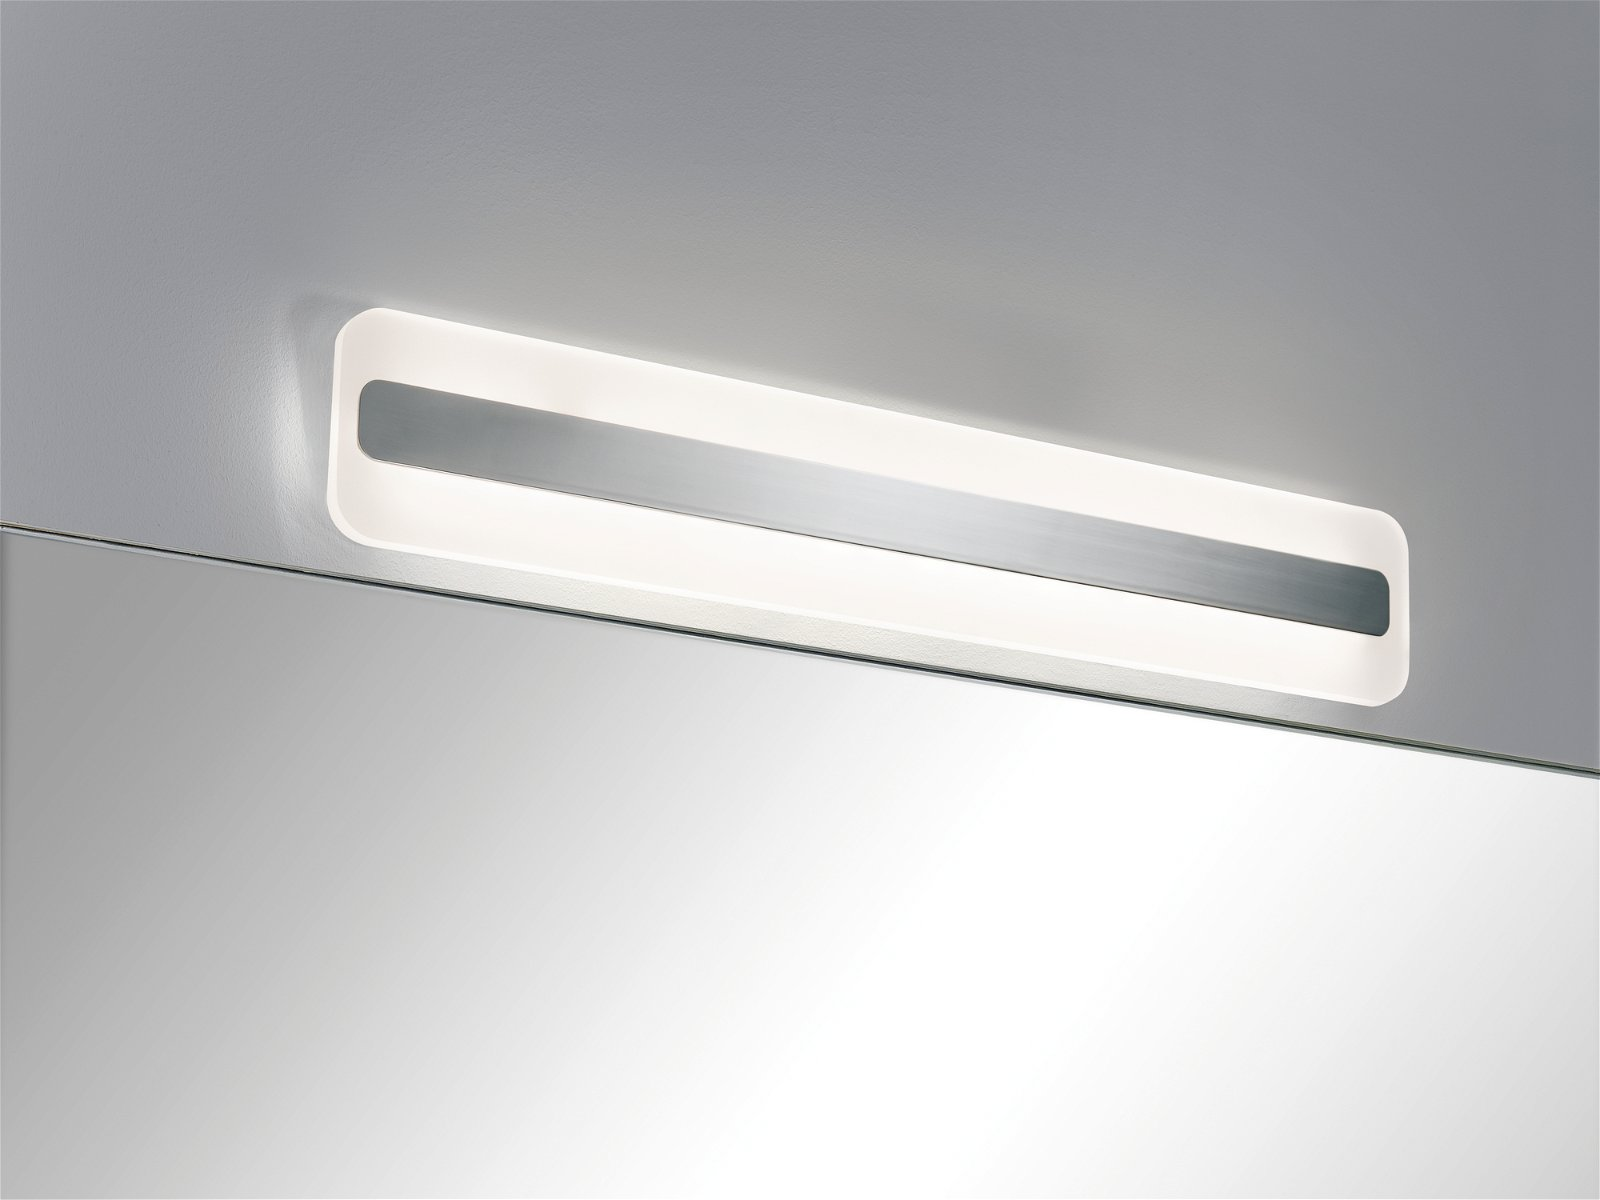 LED Spiegelleuchte Lukida IP44 3000K 650lm 230V 9W Chrom/Weiß